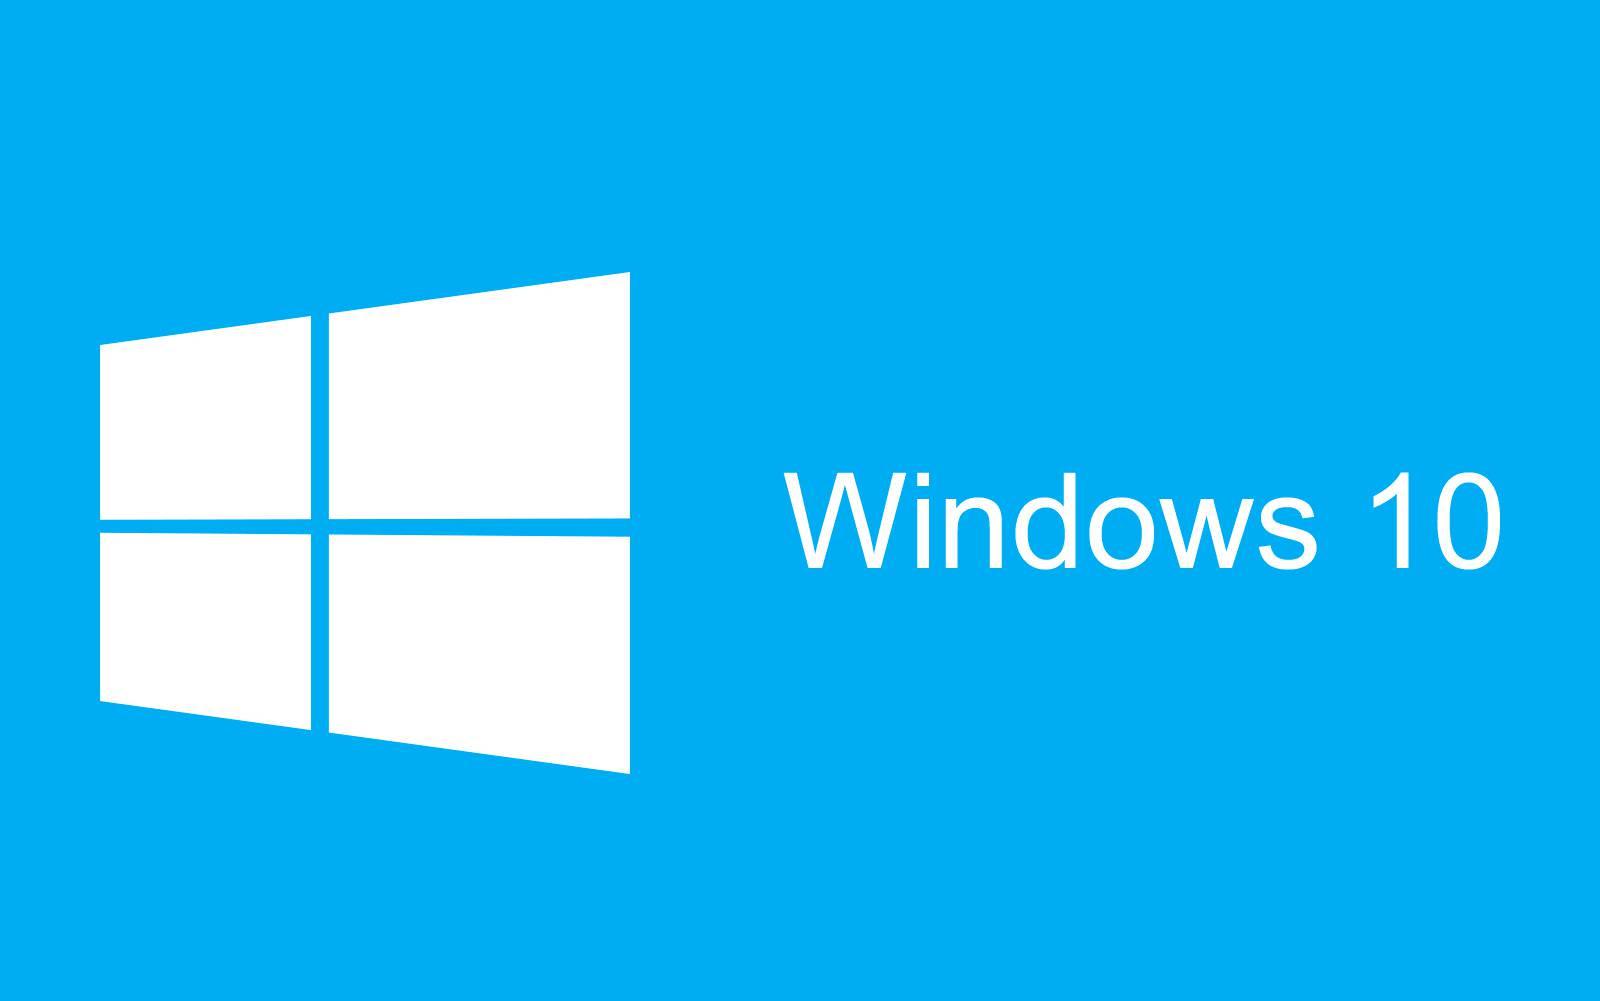 Windows 10 abandon